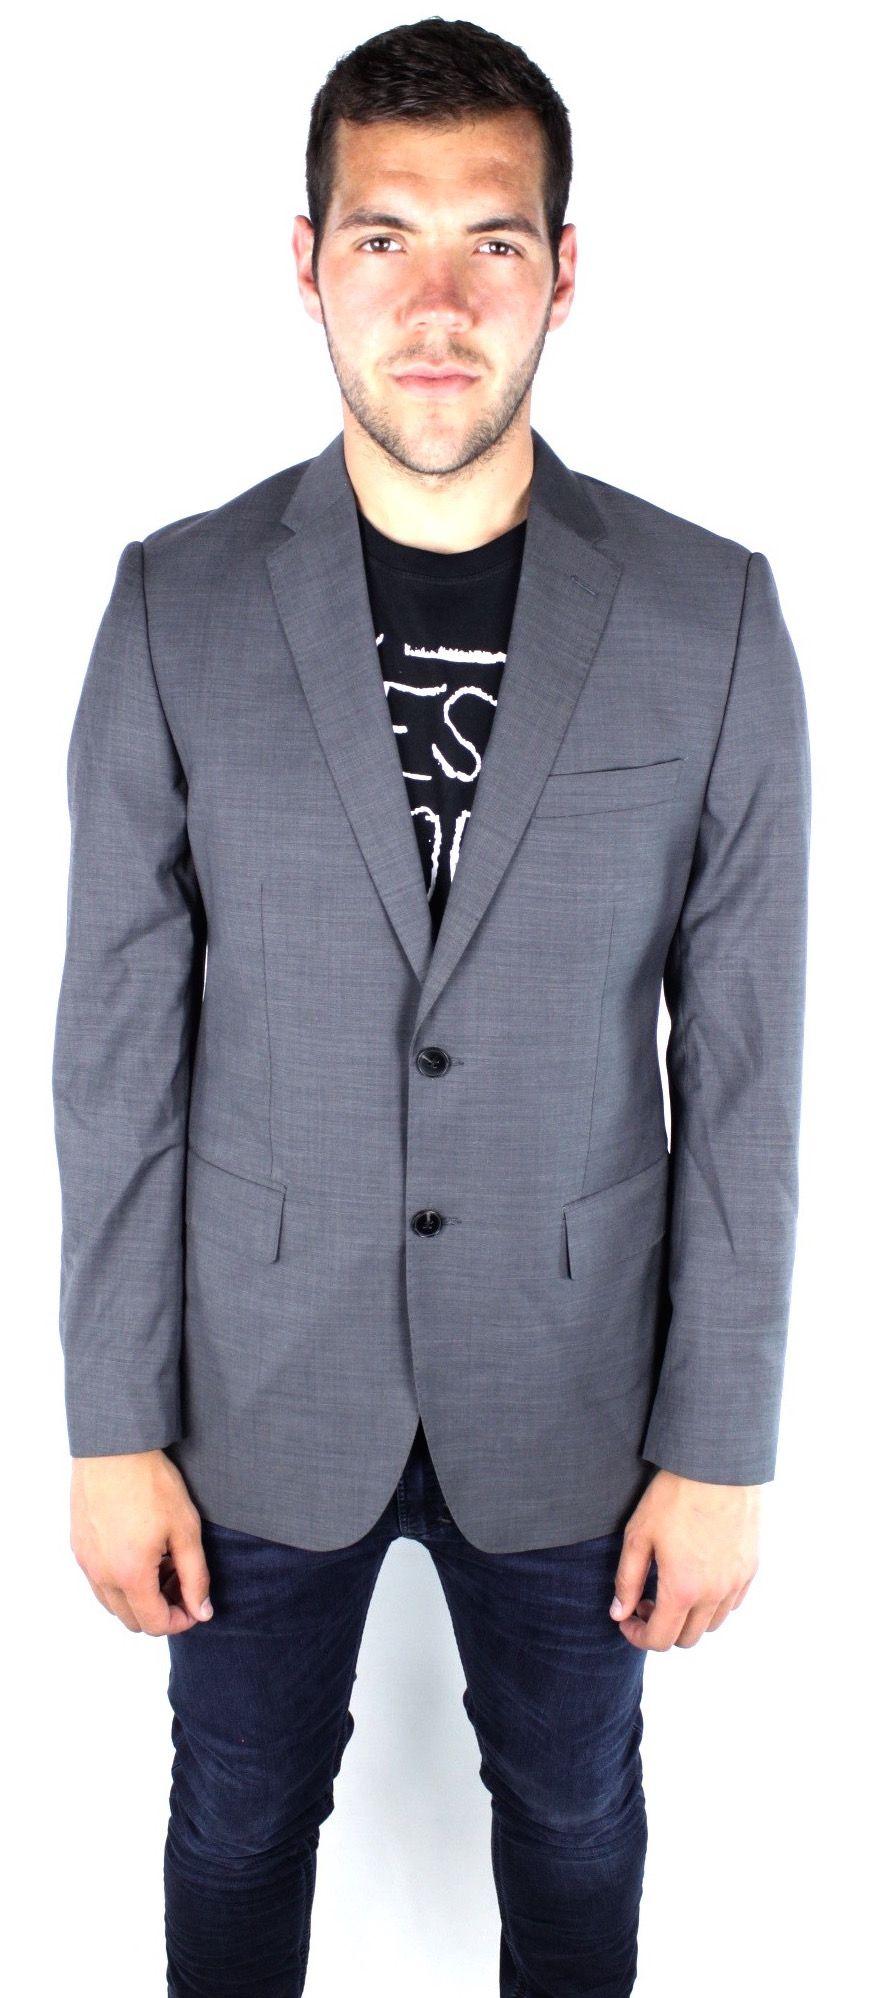 French Connection 5599J City Sharkskin Grey Jacket